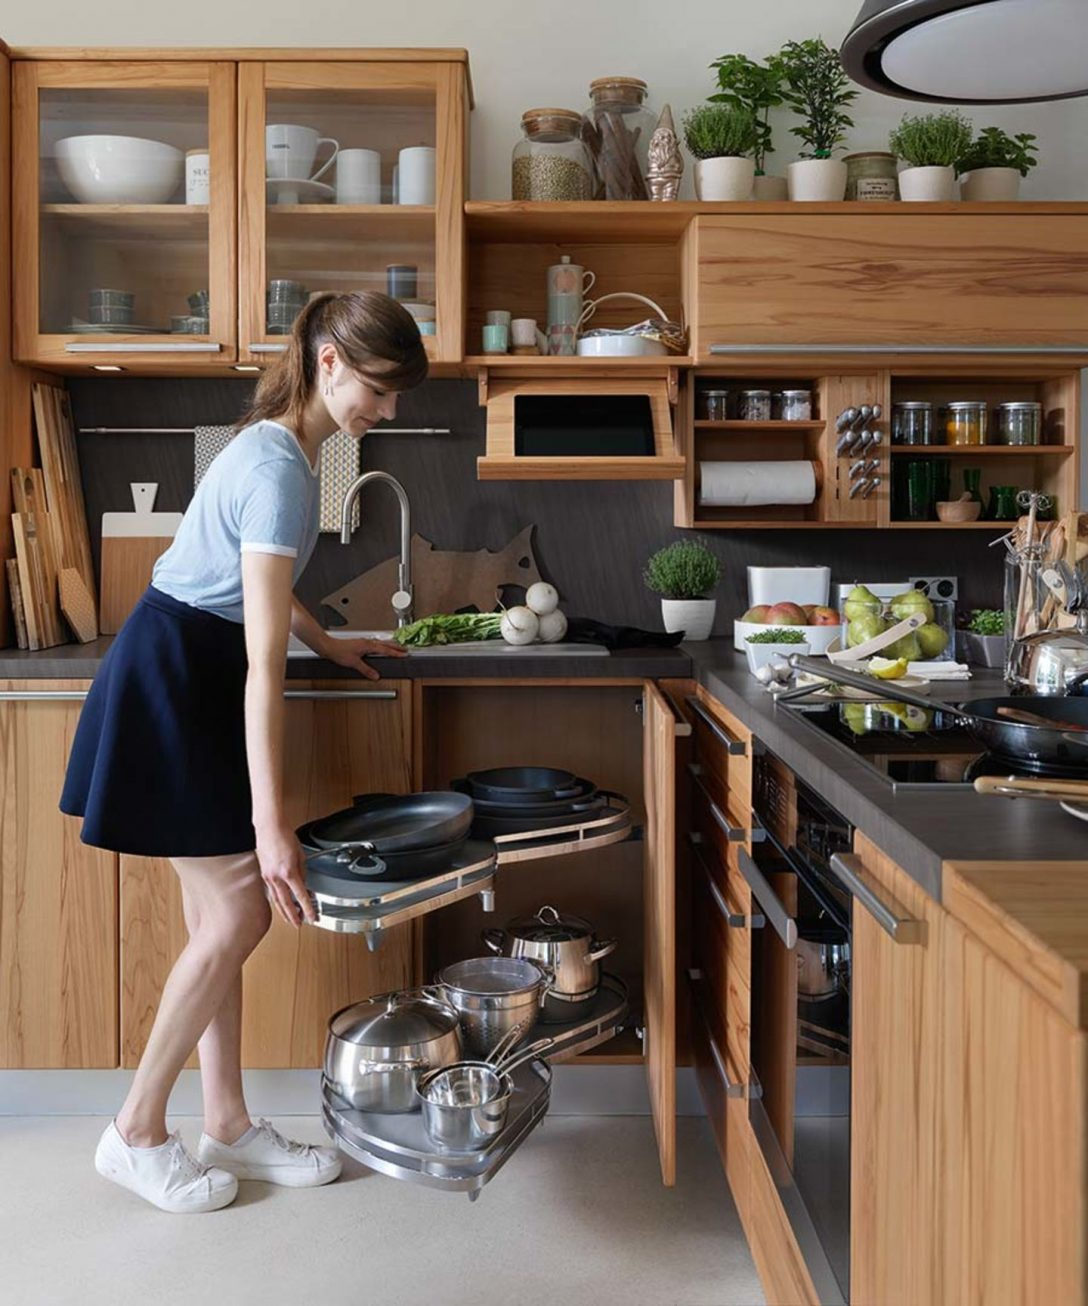 Large Size of Eckschrank Küche Nobilia Eckschrank Küche 60x60 Eckschrank Küche Auszug Ikea Eckschrank Küche Küche Eckschrank Küche